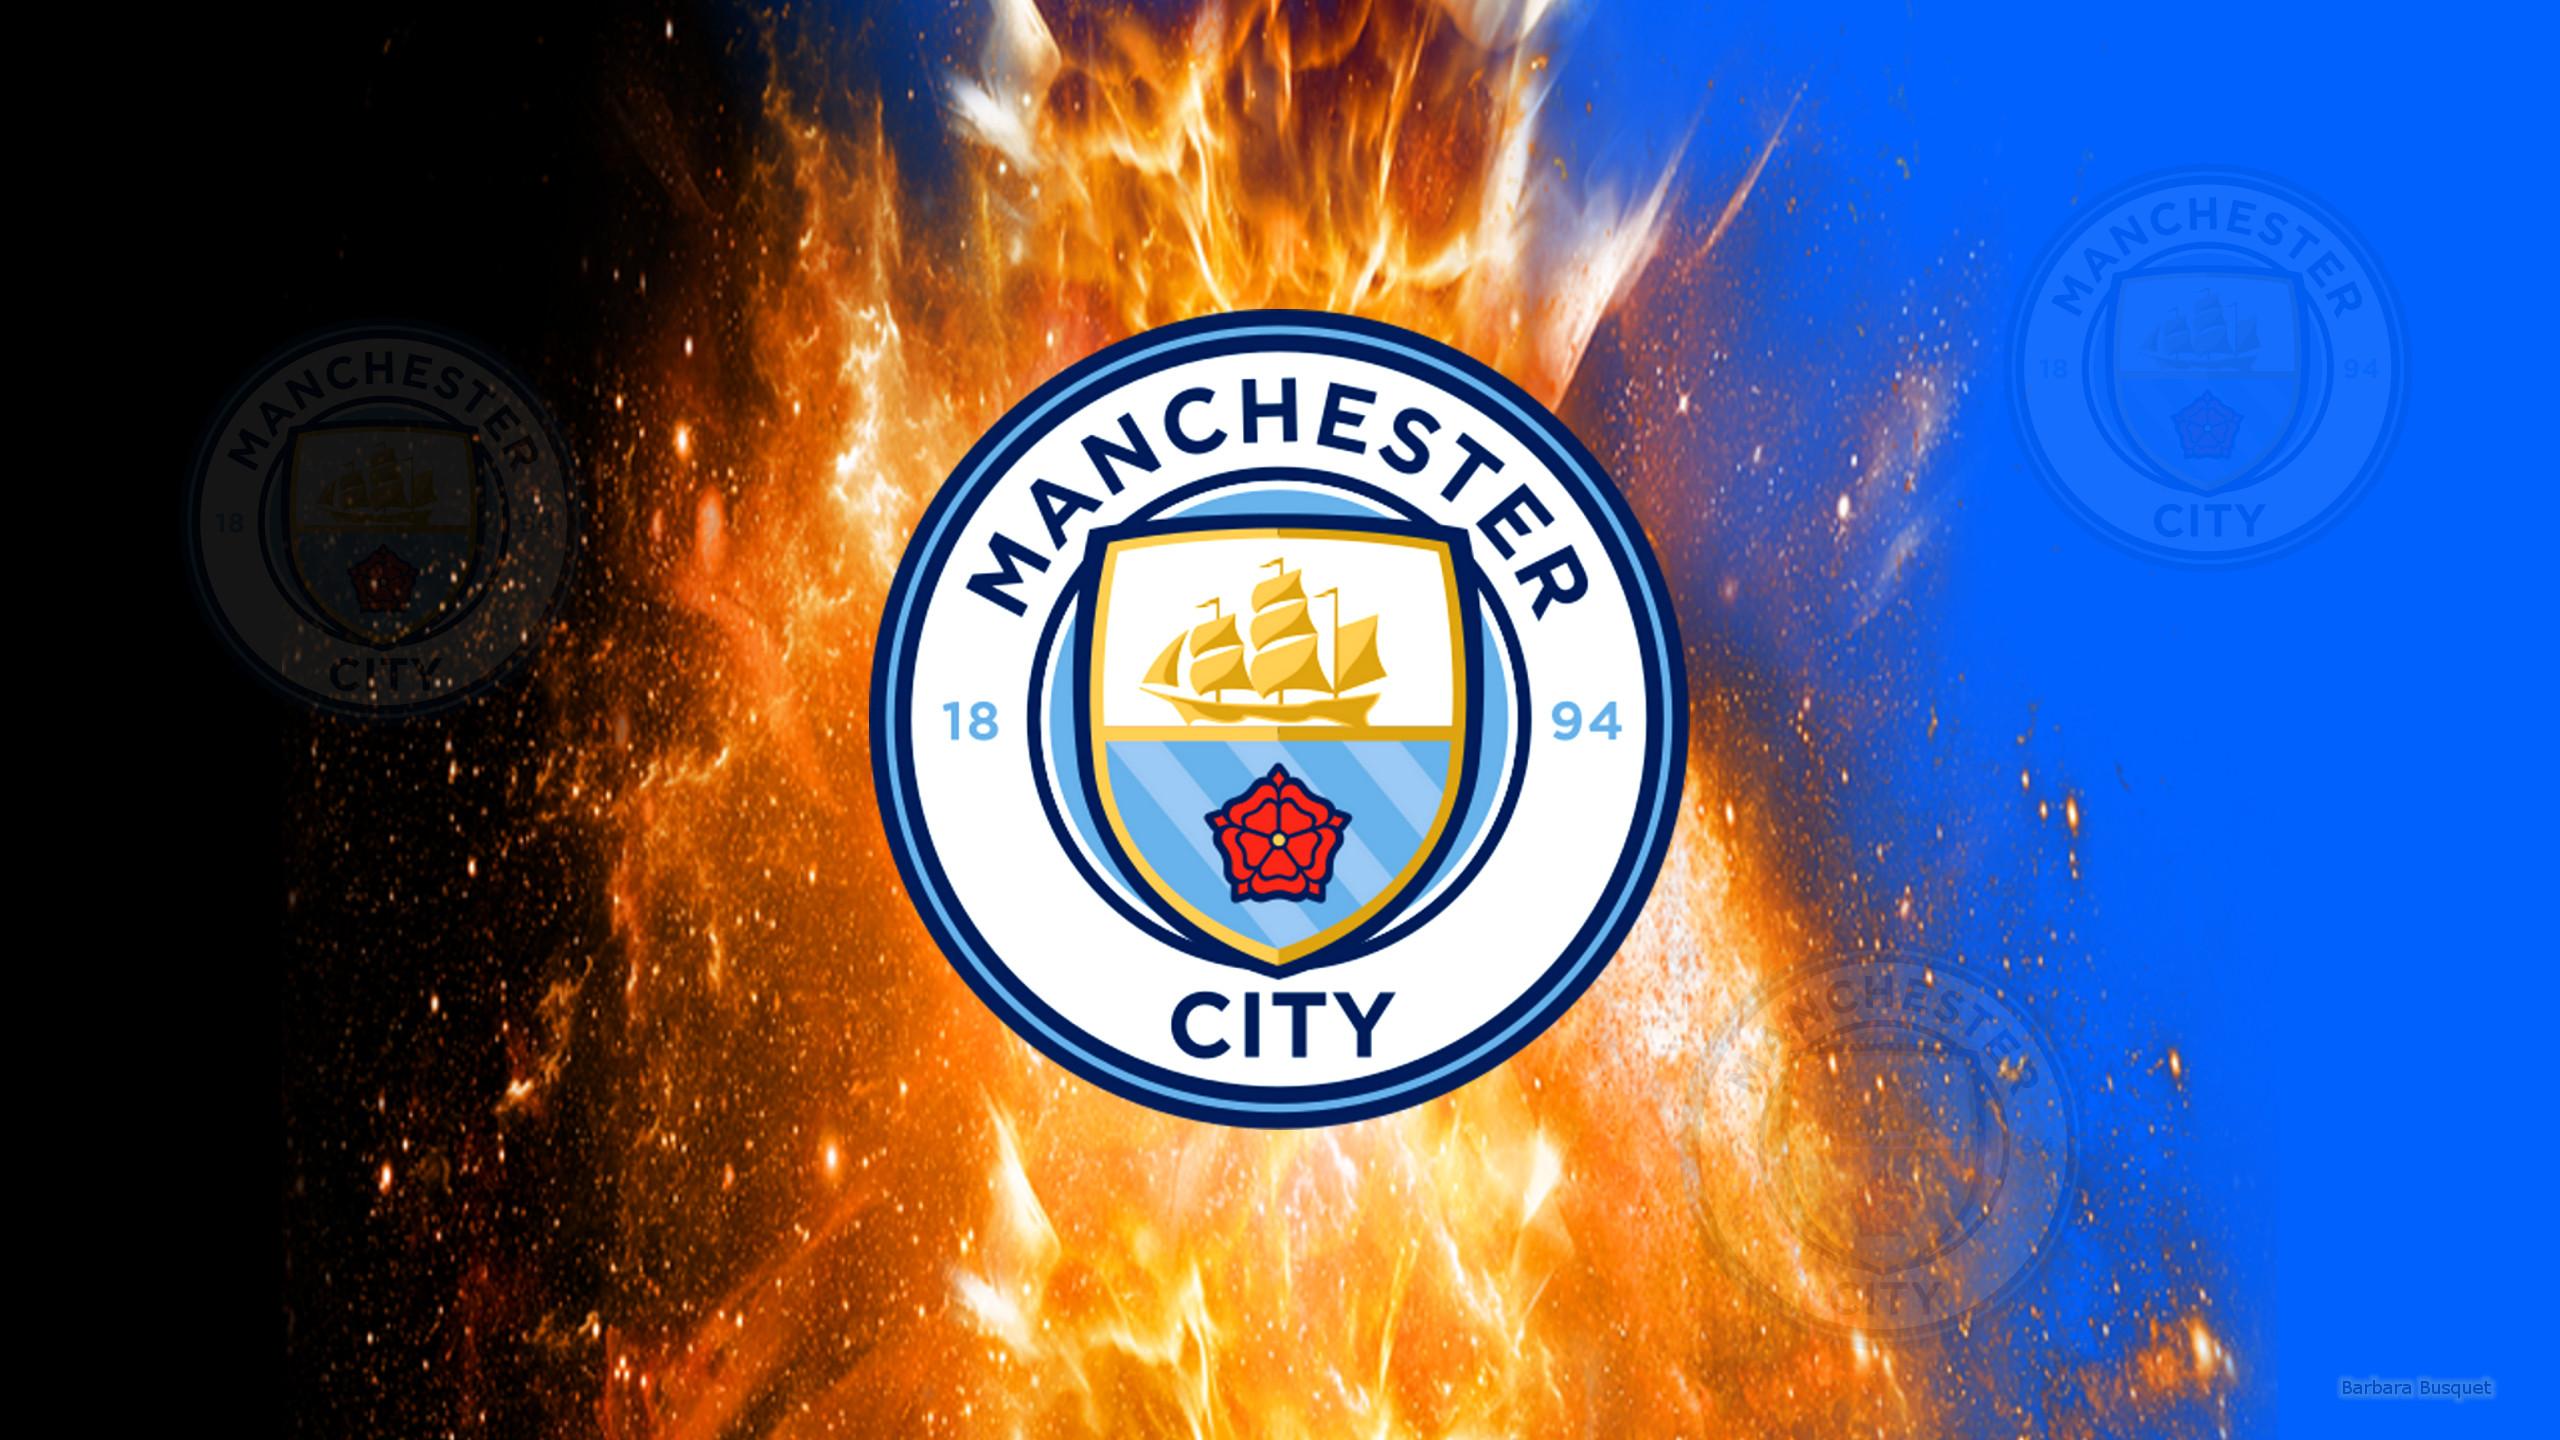 Manchester City Fc Fondo De Pantalla Hd Fondo De